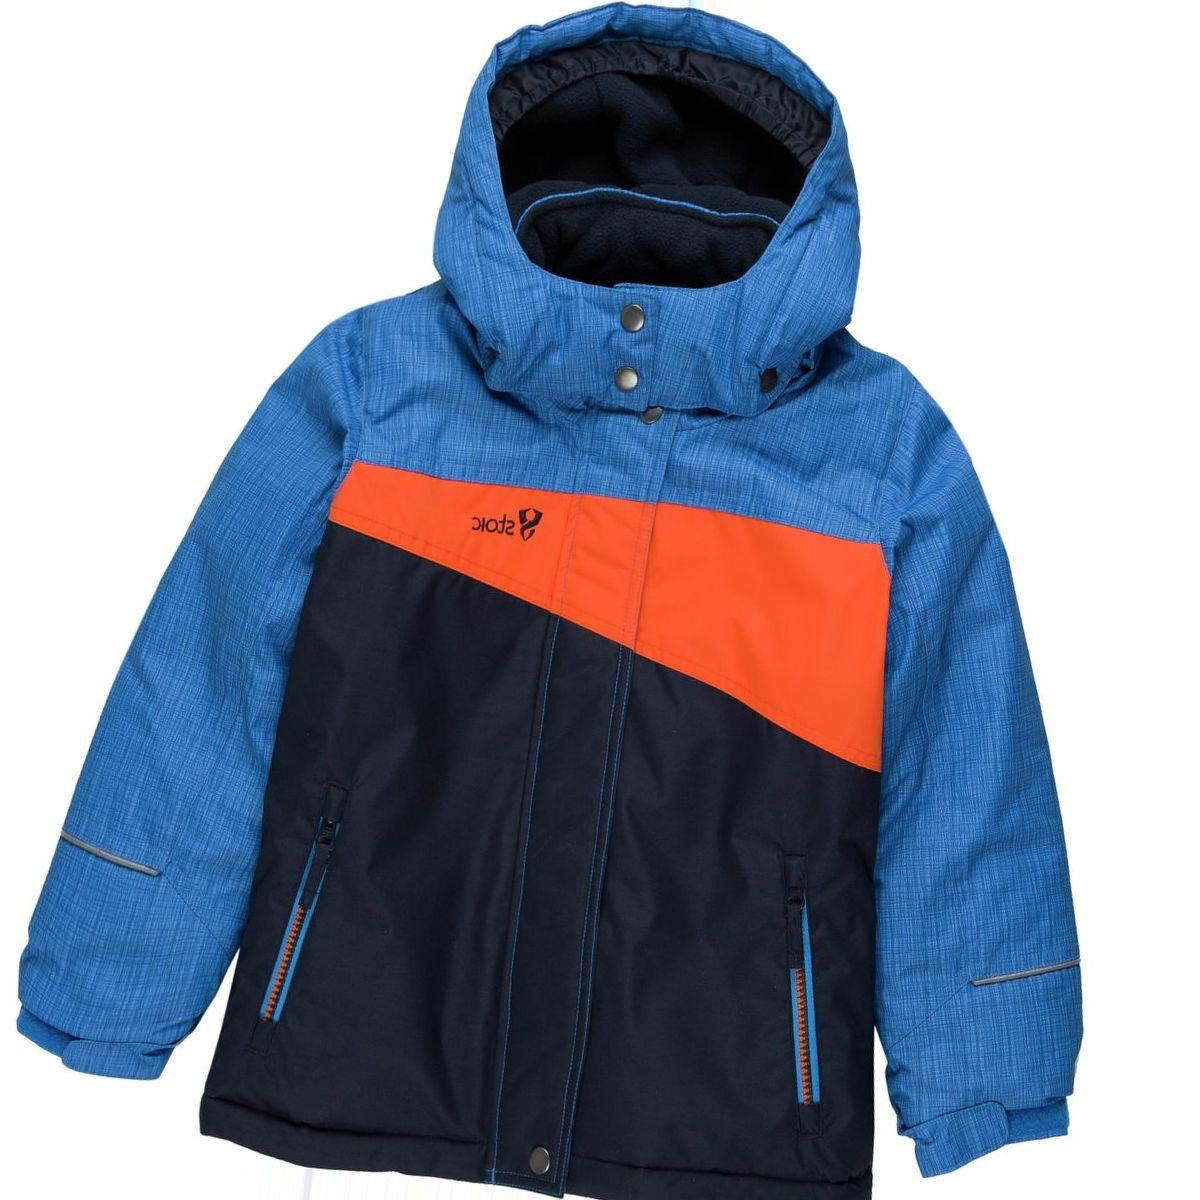 Stoic Bomber Colorblock Ski Jacket - Boys'